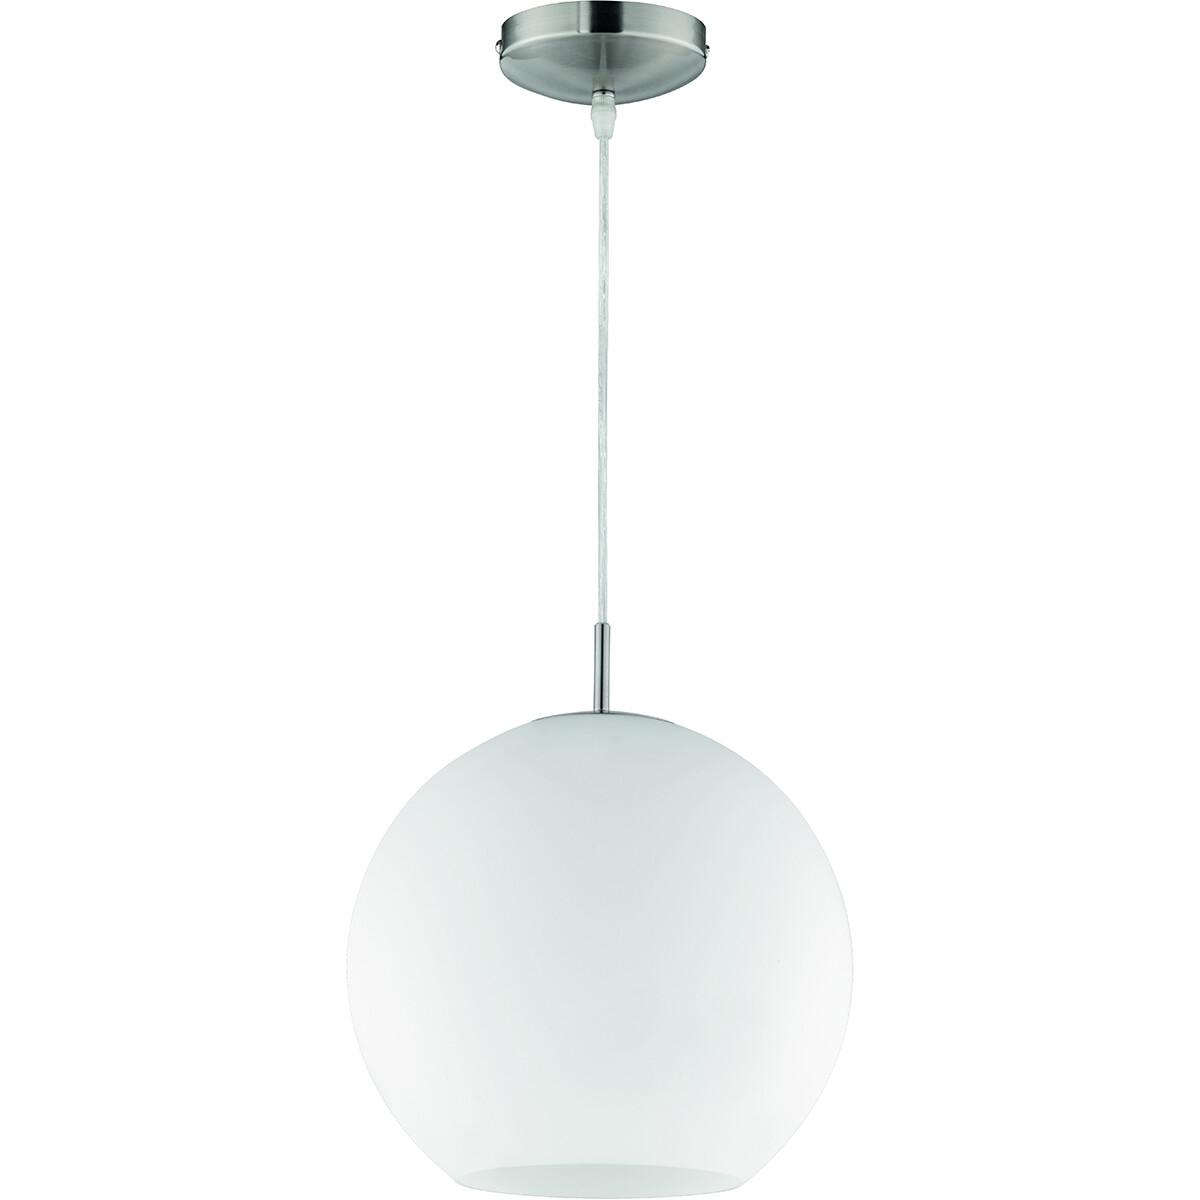 LED Hanglamp - Hangverlichting - Trion Mono XL - E27 Fitting - Rond - Mat Nikkel - Aluminium